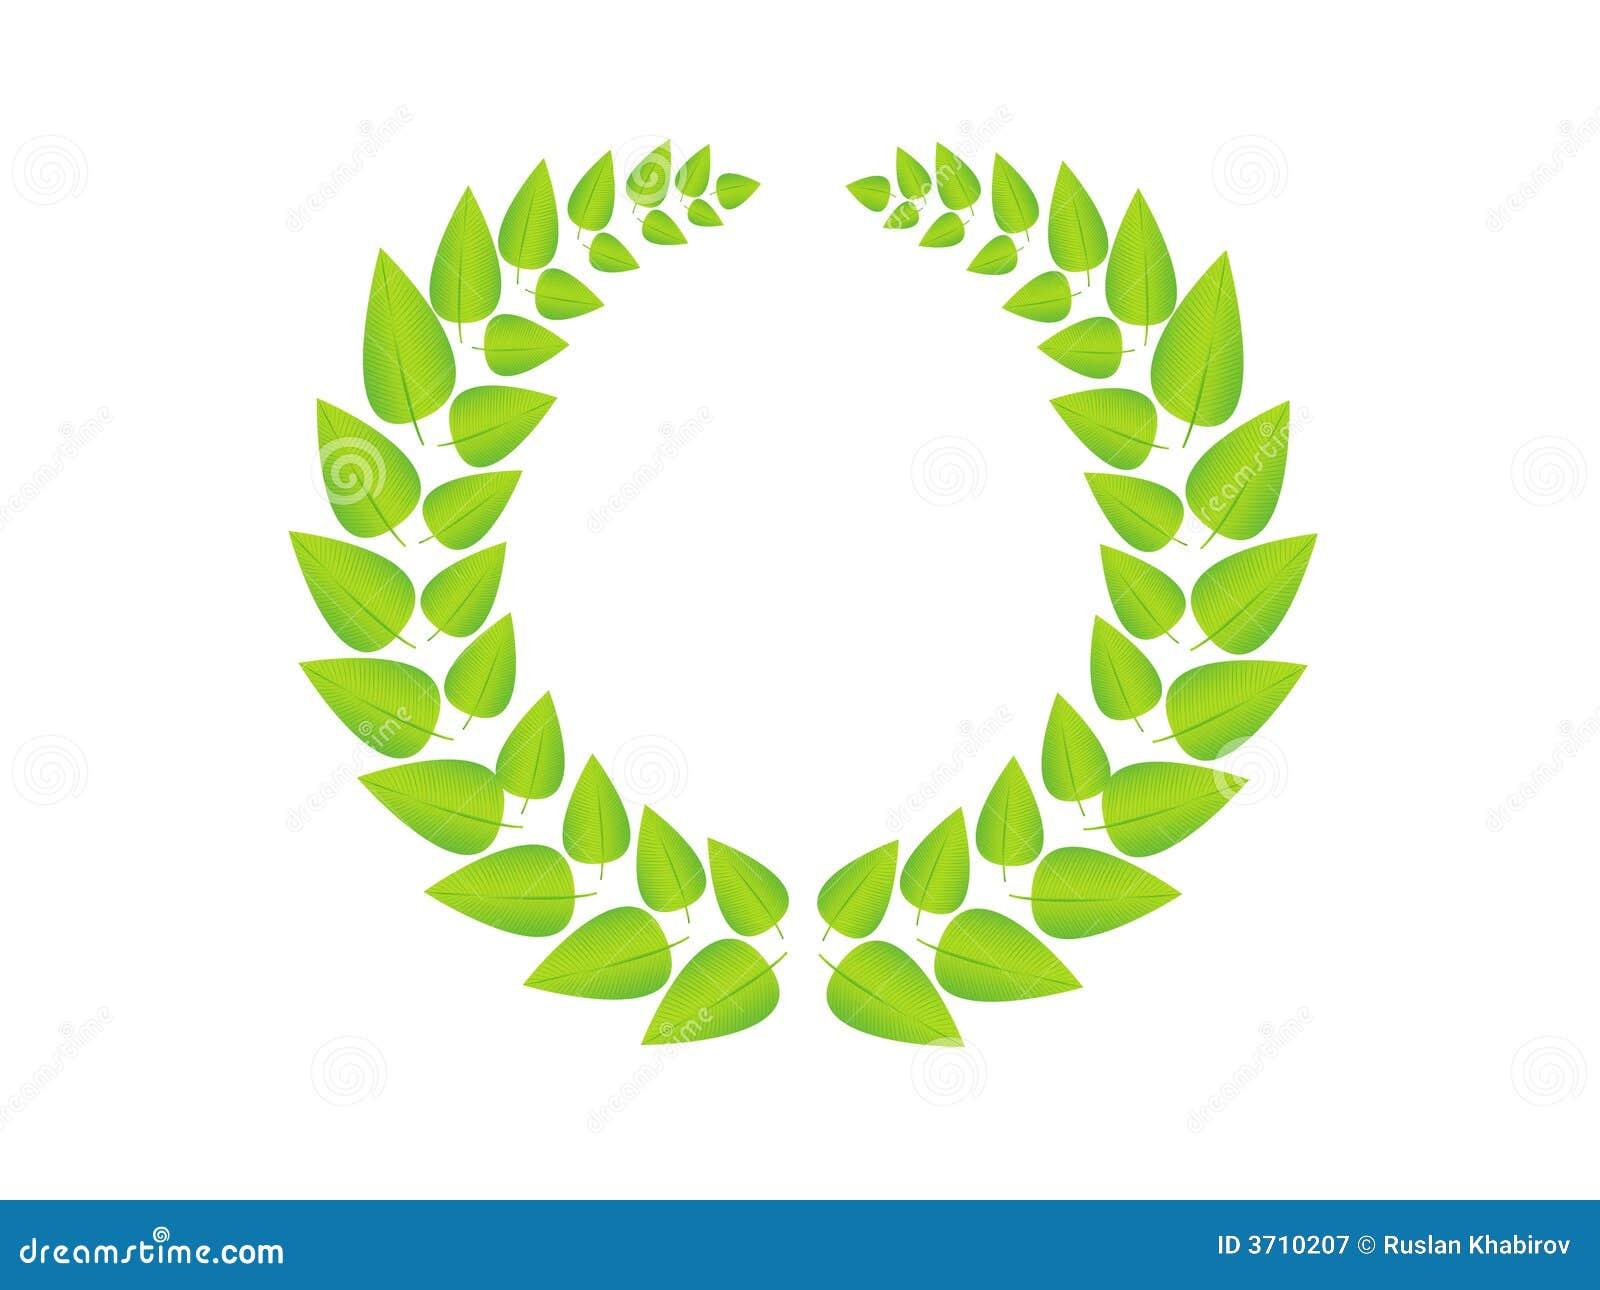 GreenWreath